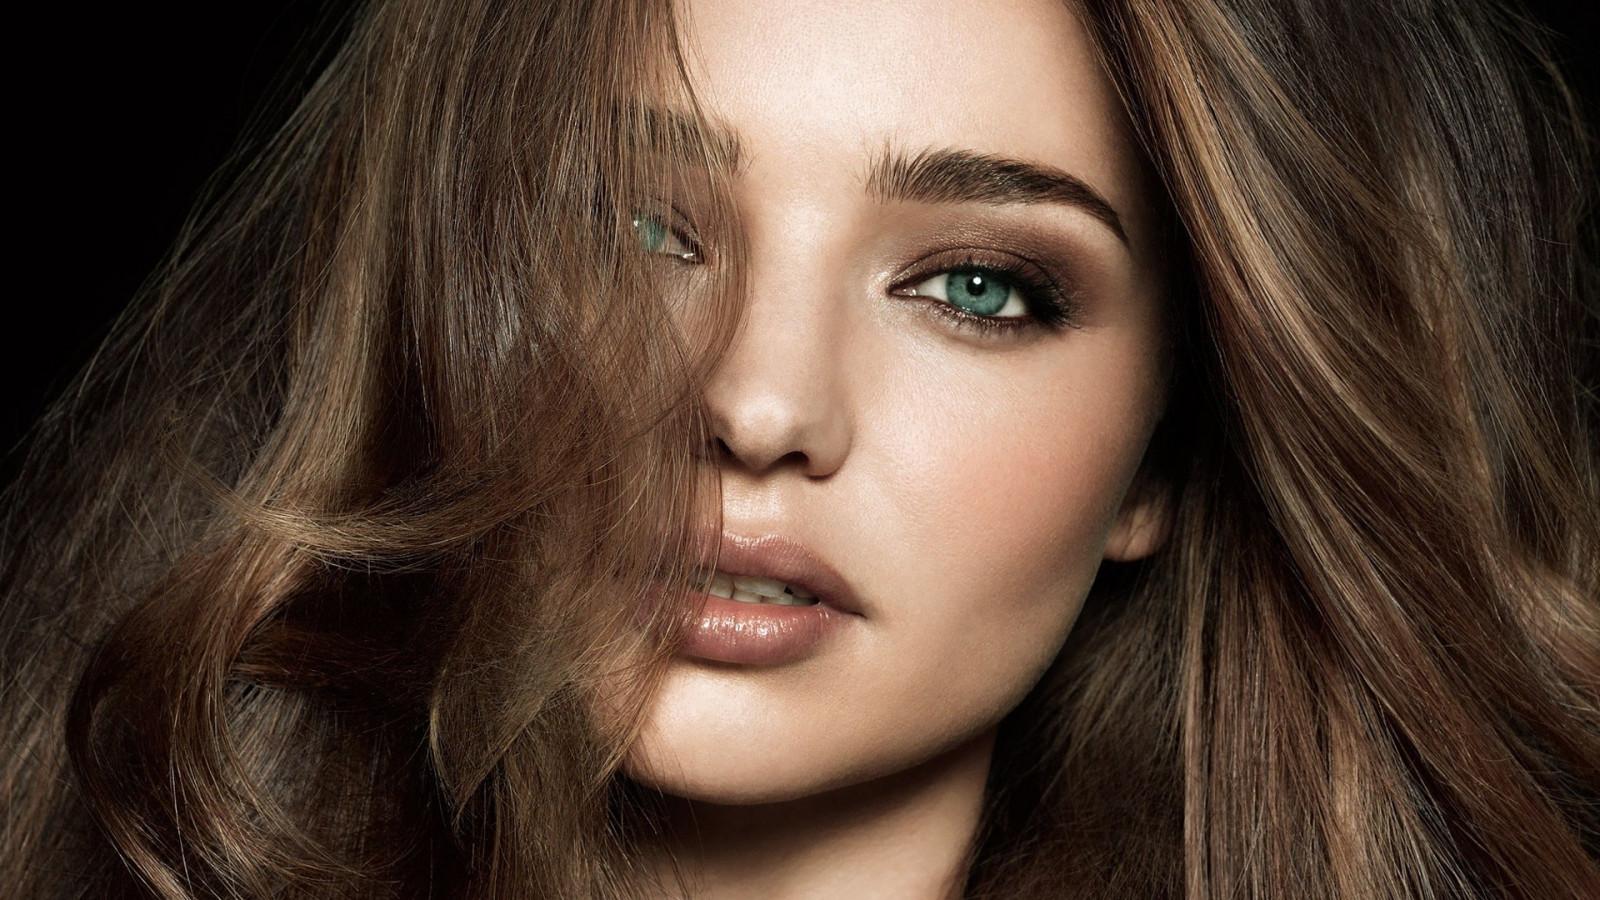 Wallpaper : face, women, model, long hair, blue eyes ...